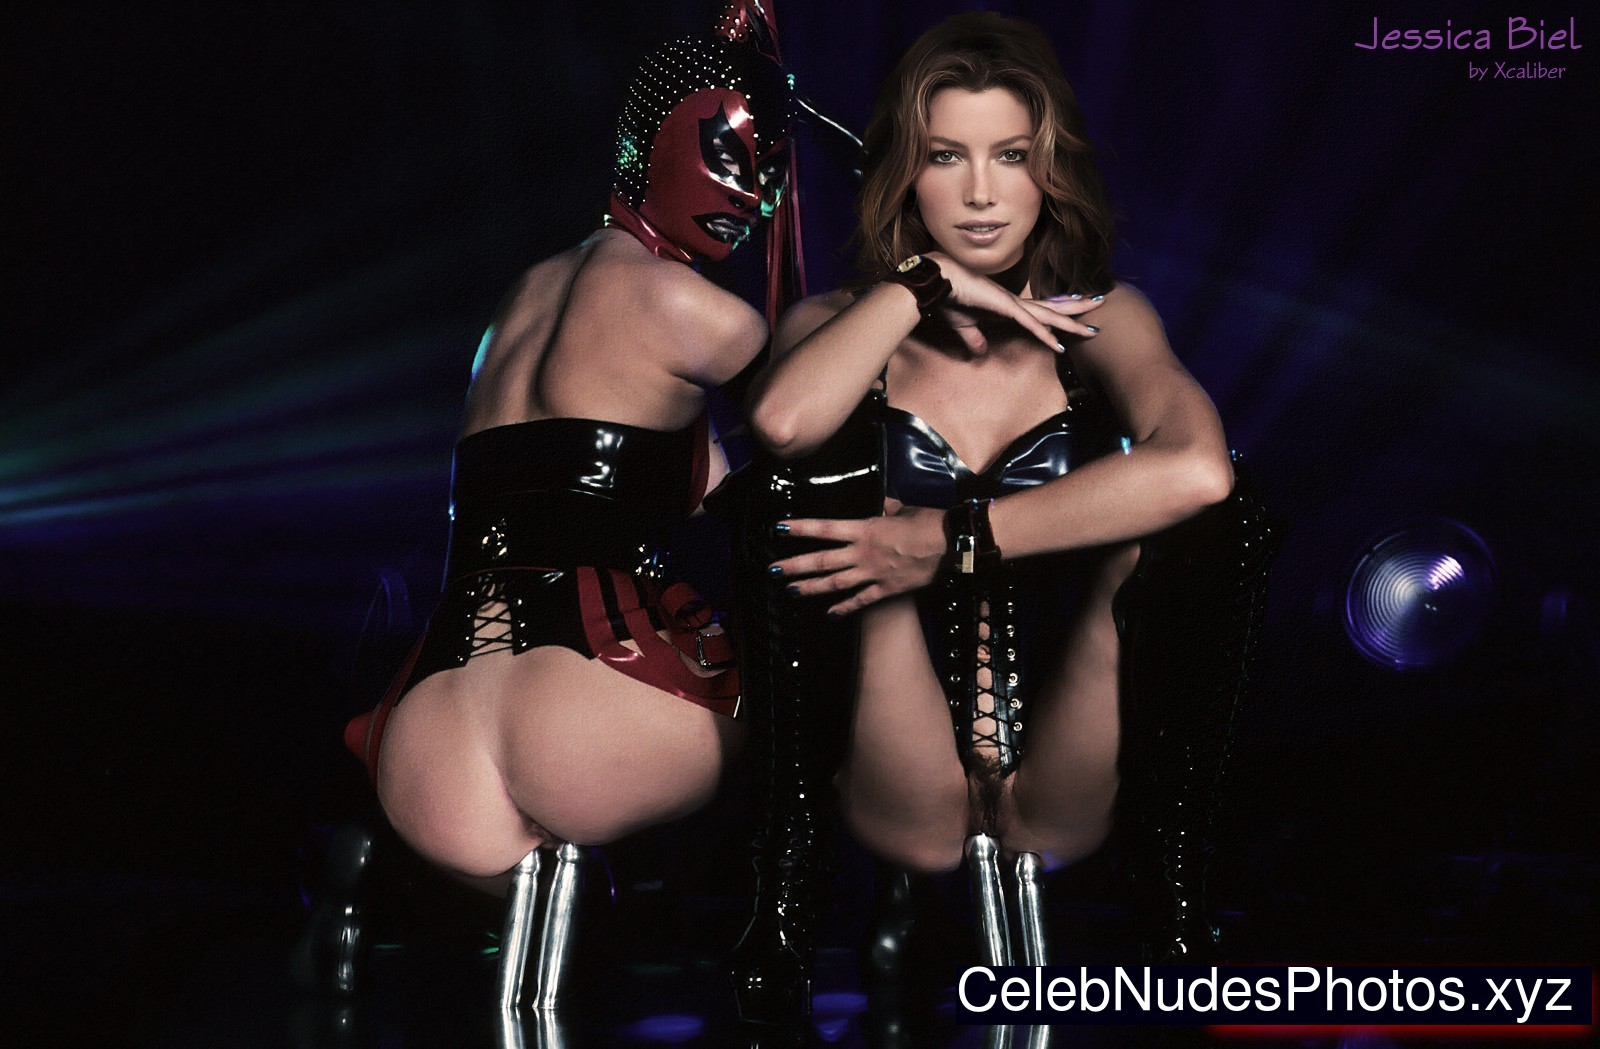 Jessica Biel Celebrity Nude Pic sexy 26